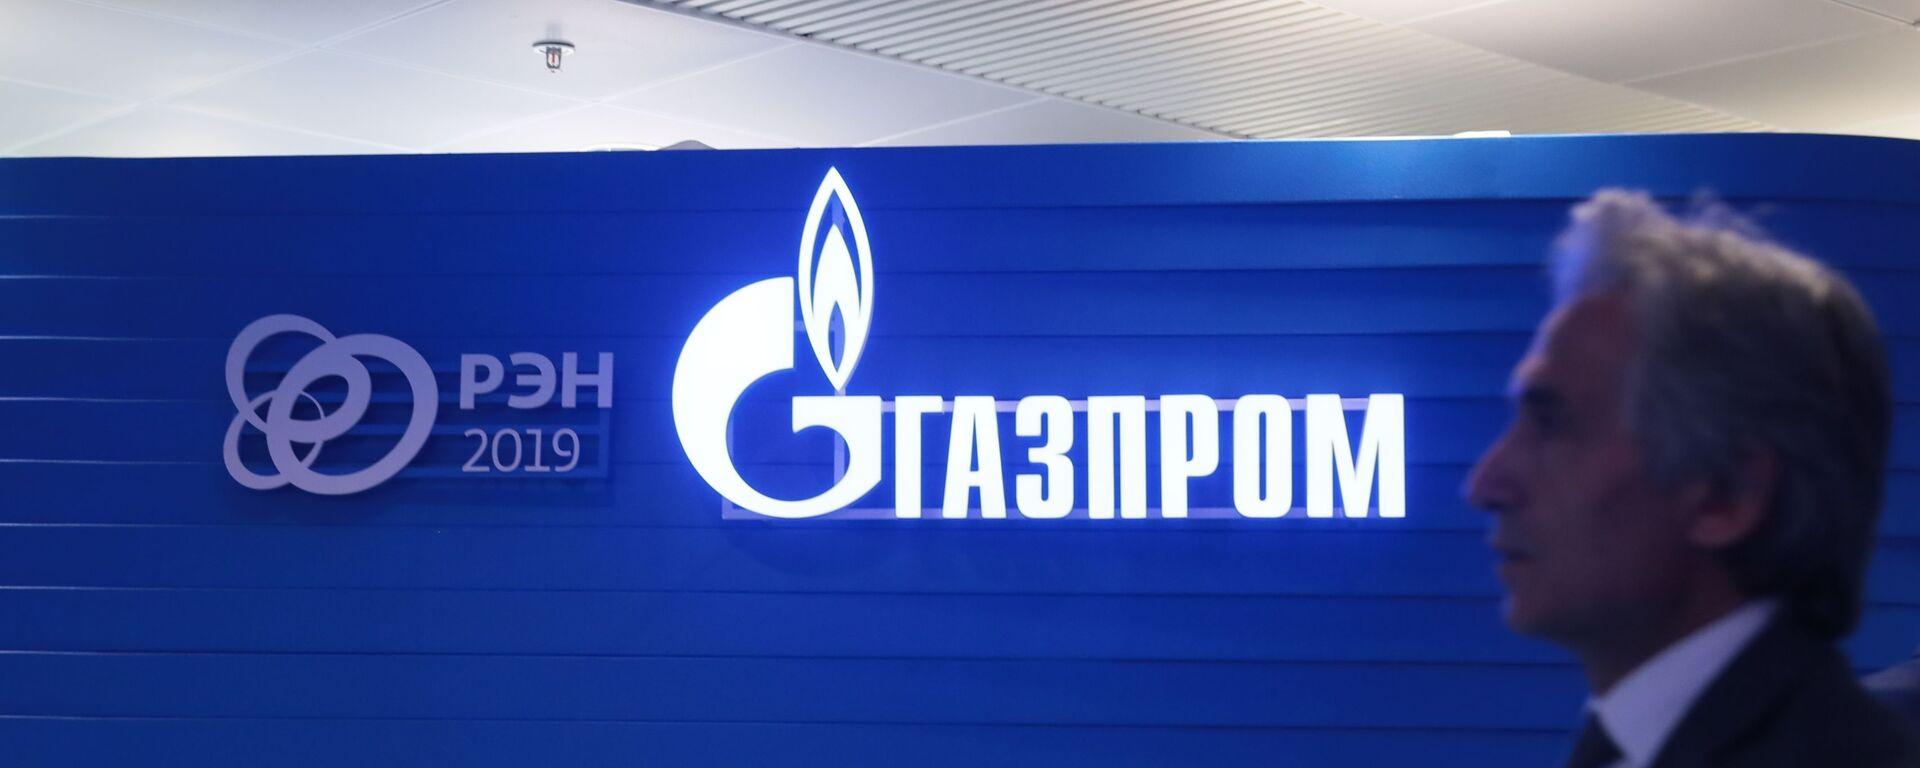 Логотип ПАО Газпром - Sputnik Тоҷикистон, 1920, 24.07.2020